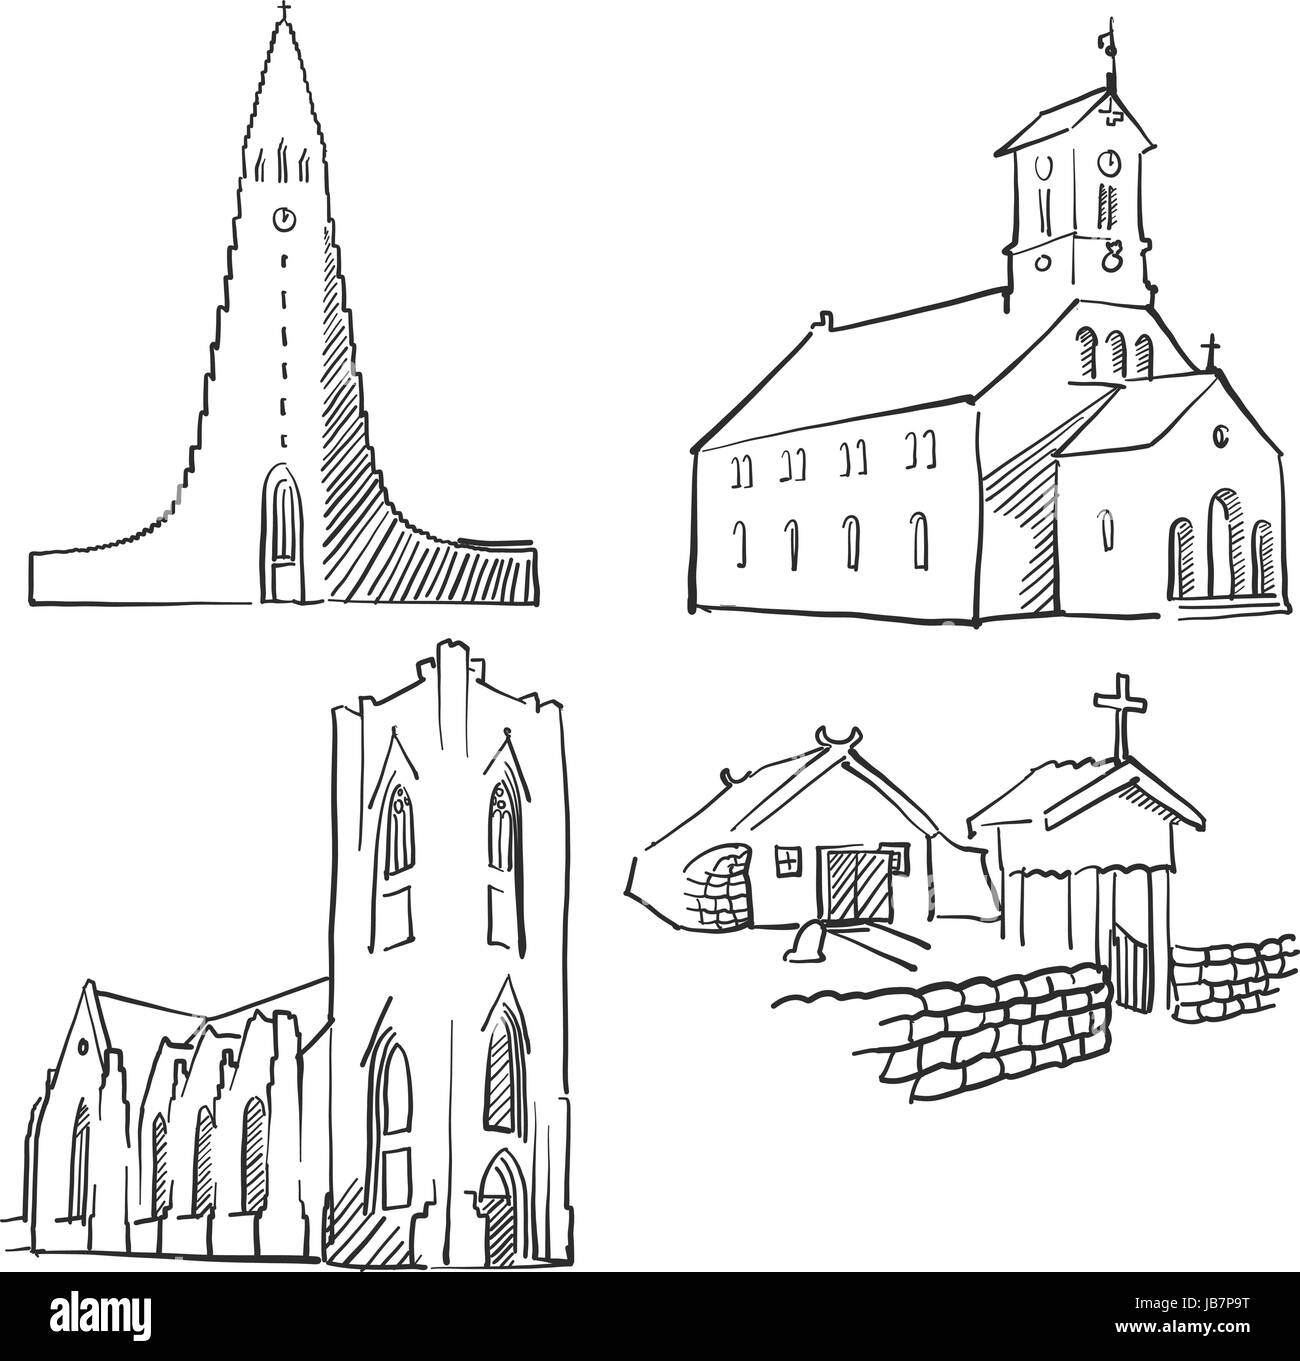 Reykjavik Iceland Famous Buildings, Monochrome Outlined Travel Landmarks, Scalable Vector Illustration - Stock Image